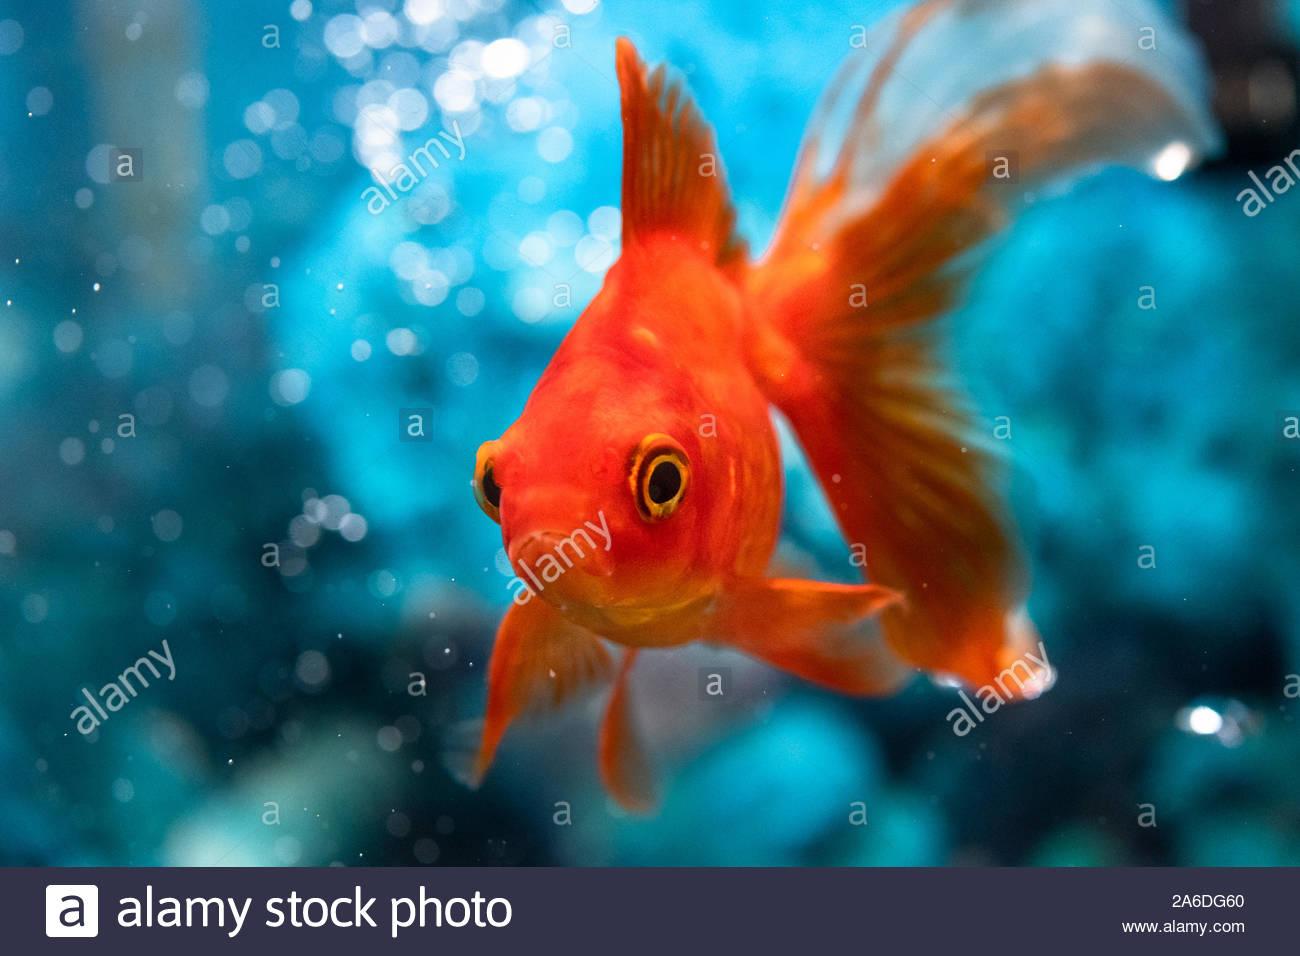 Beautiful Red Goldfish Swimming In A Fish Tank Or Home Aquarium Stock Photo Alamy